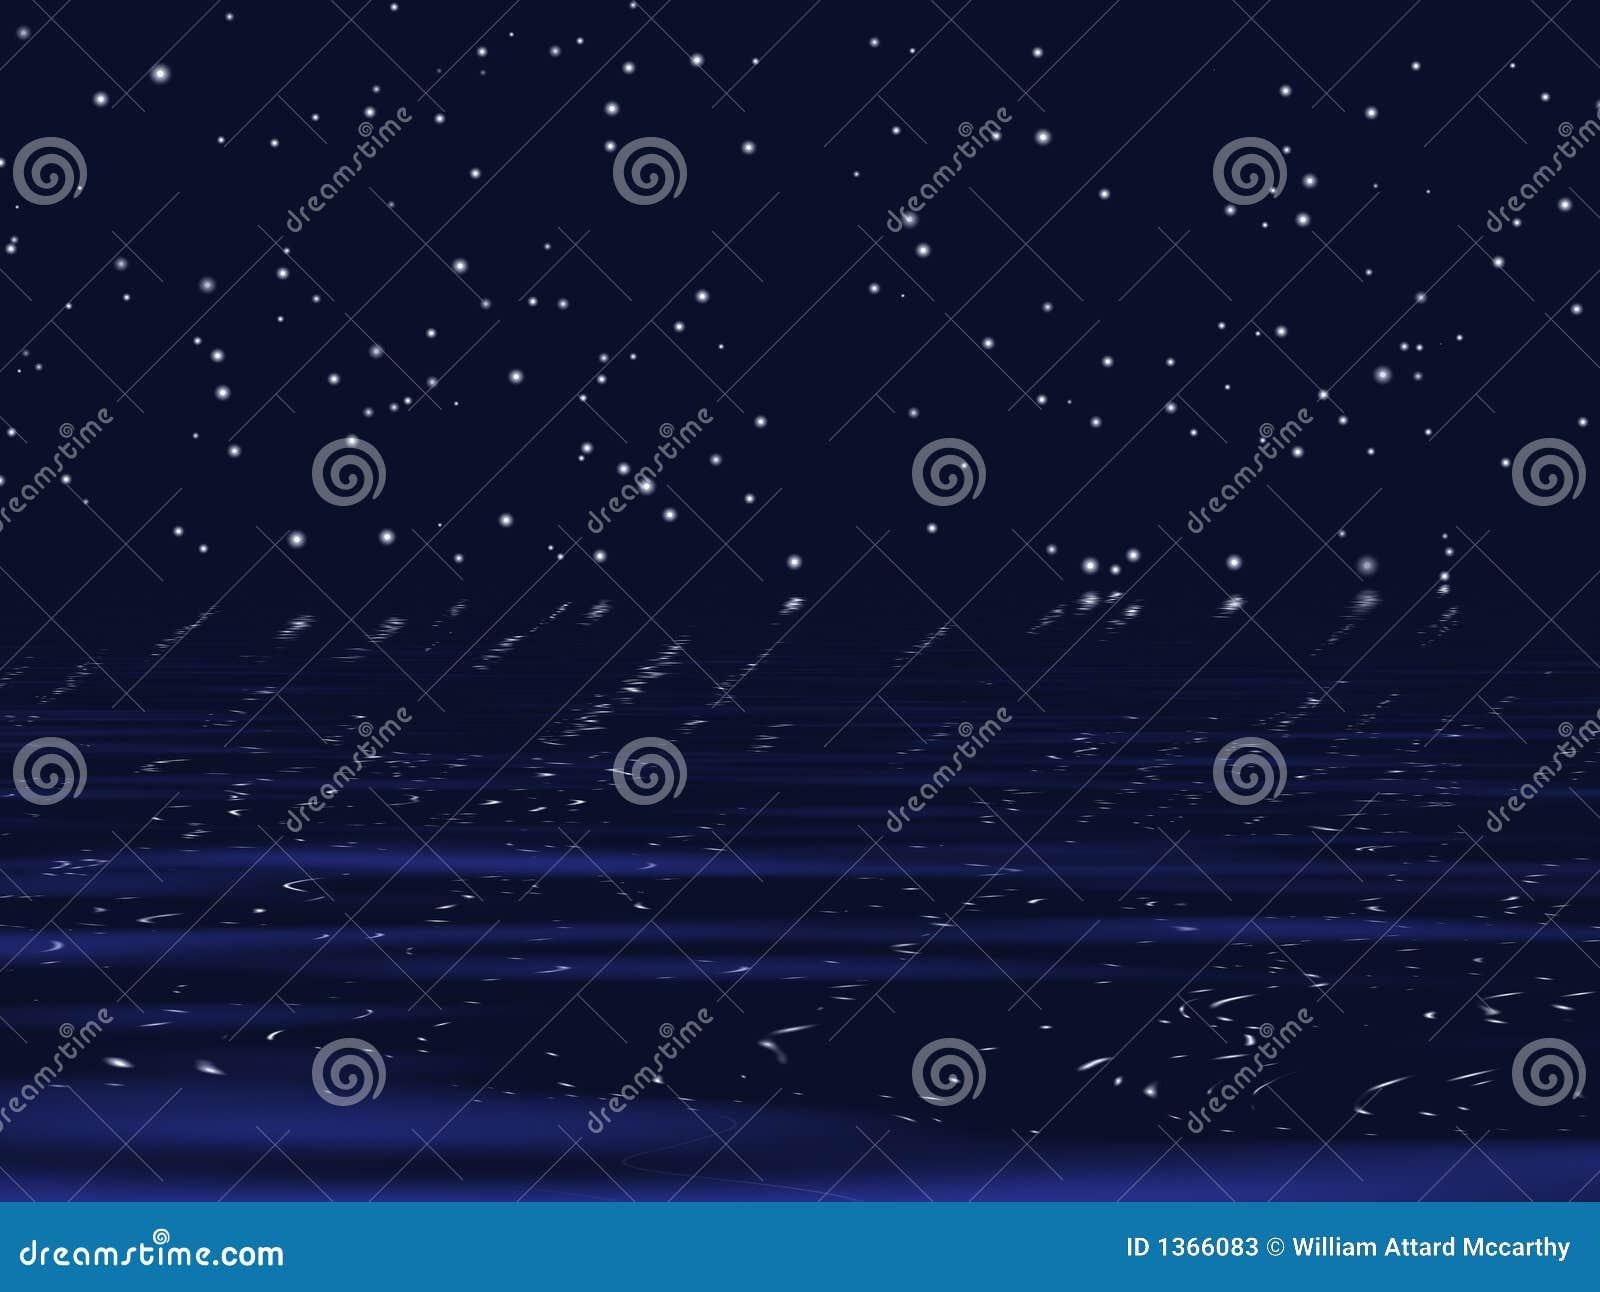 Starry Night Background Stock Photos